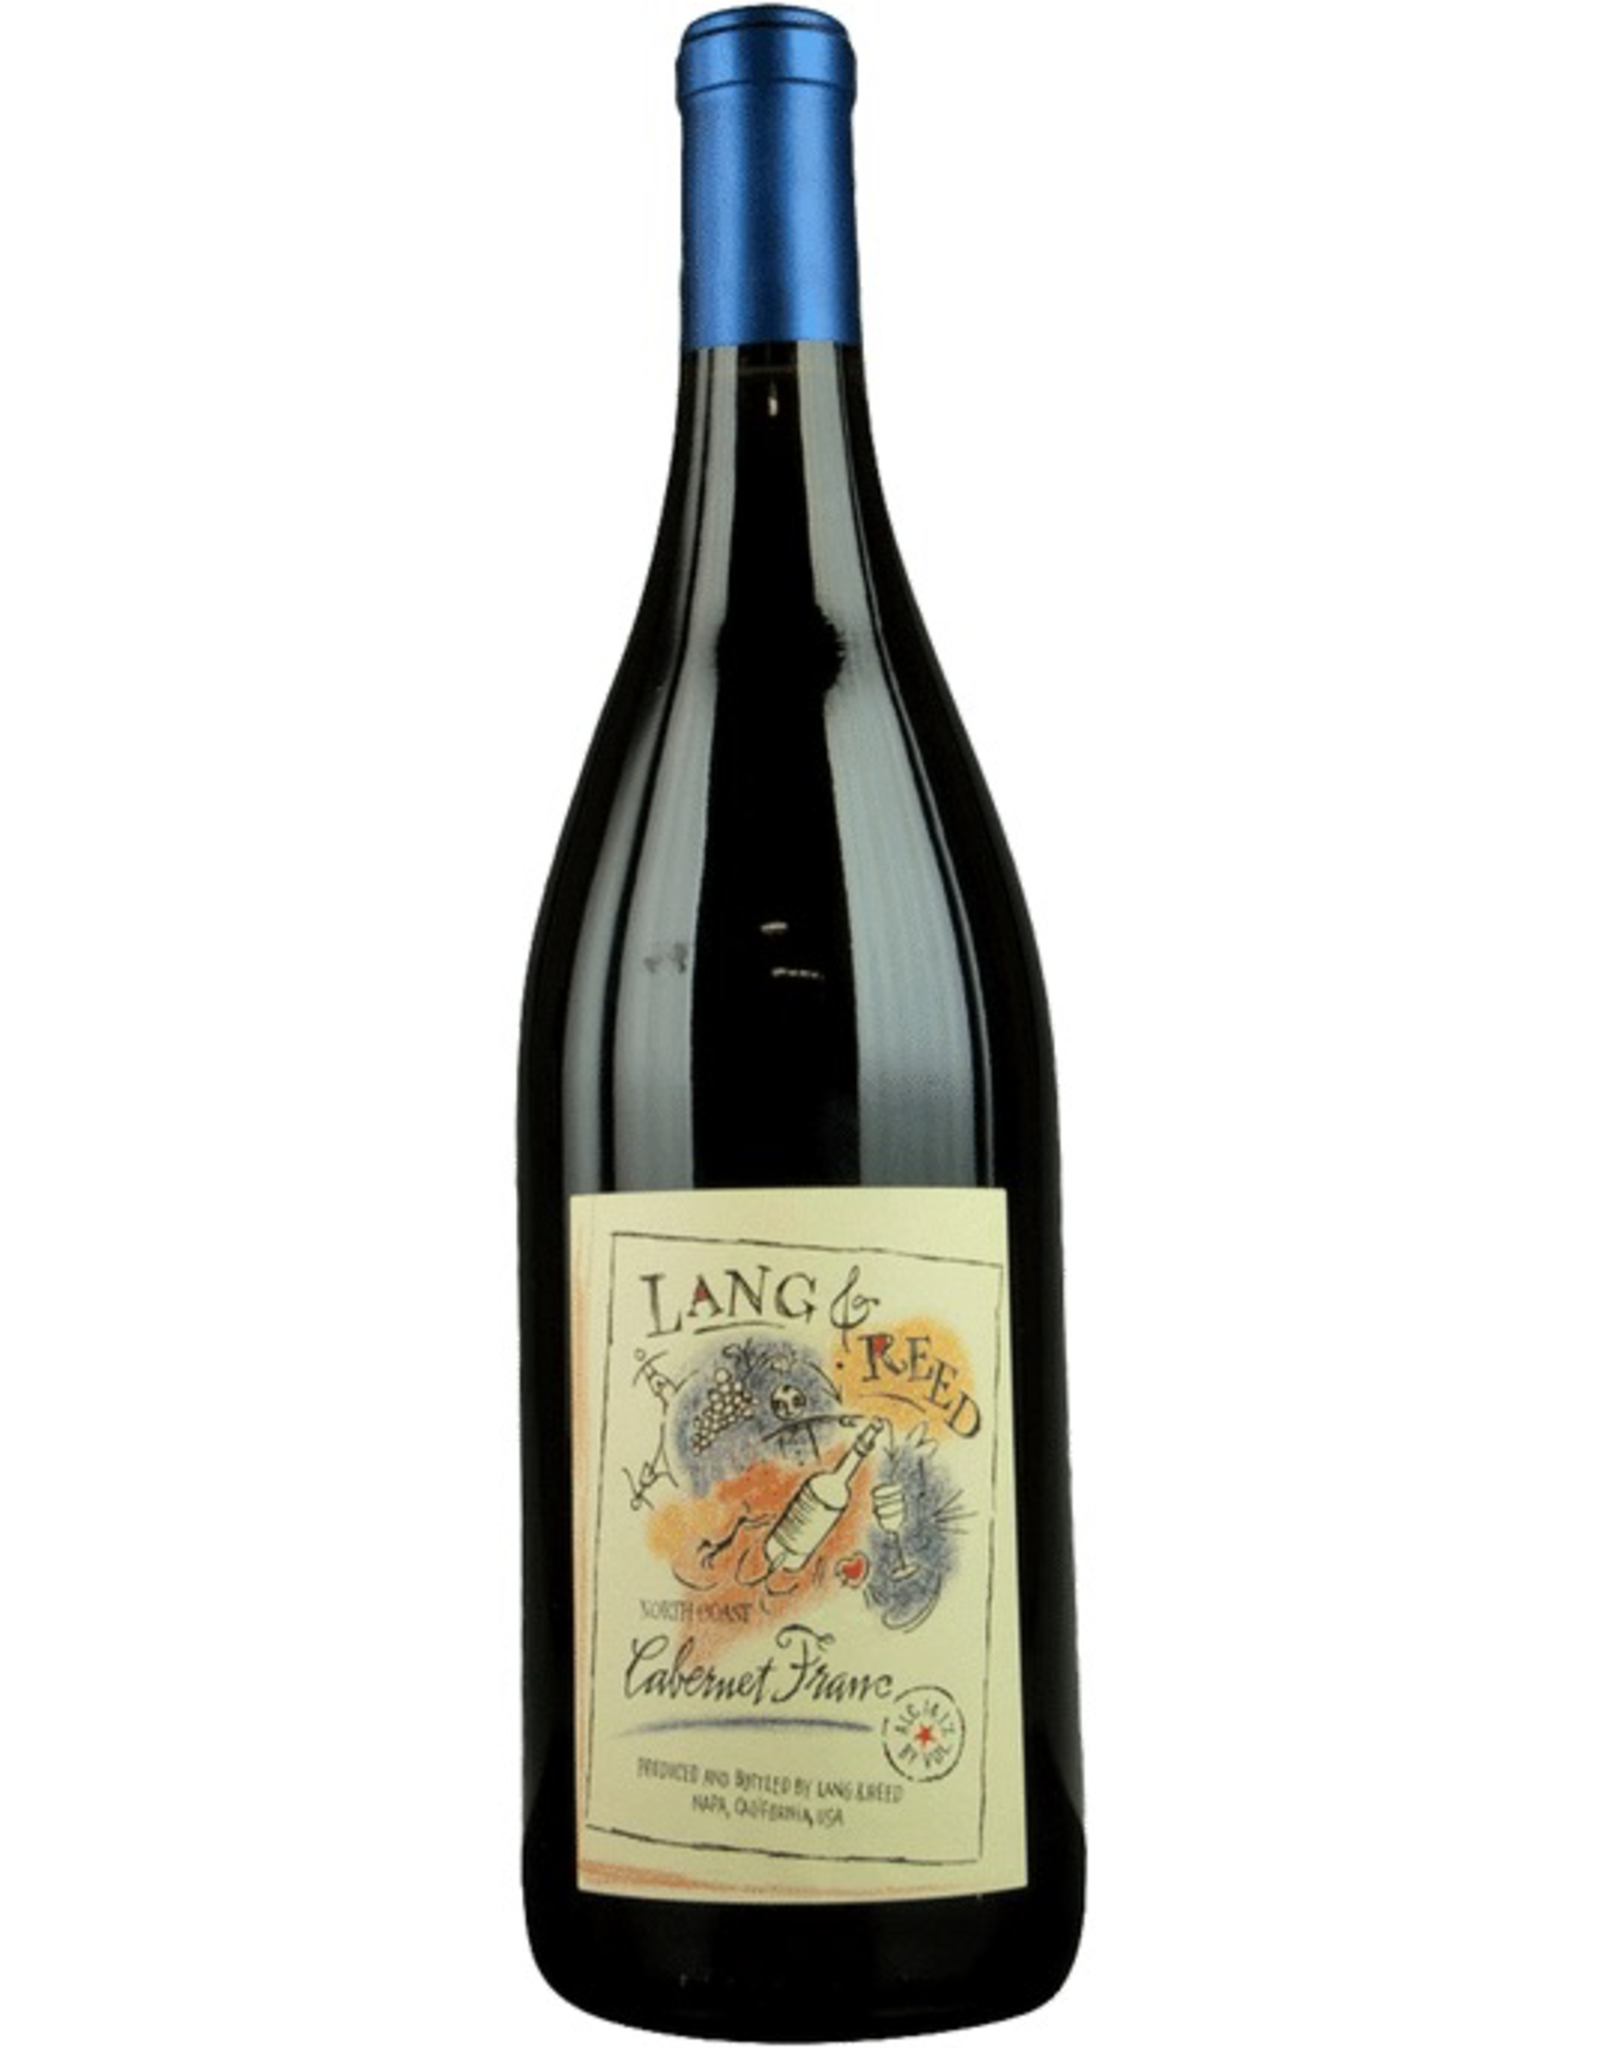 Red Wine 2016, Lang & Reed North Coast, Cabernet Franc, Napa Valley, Napa, California, 14.1% Alc, CTnr